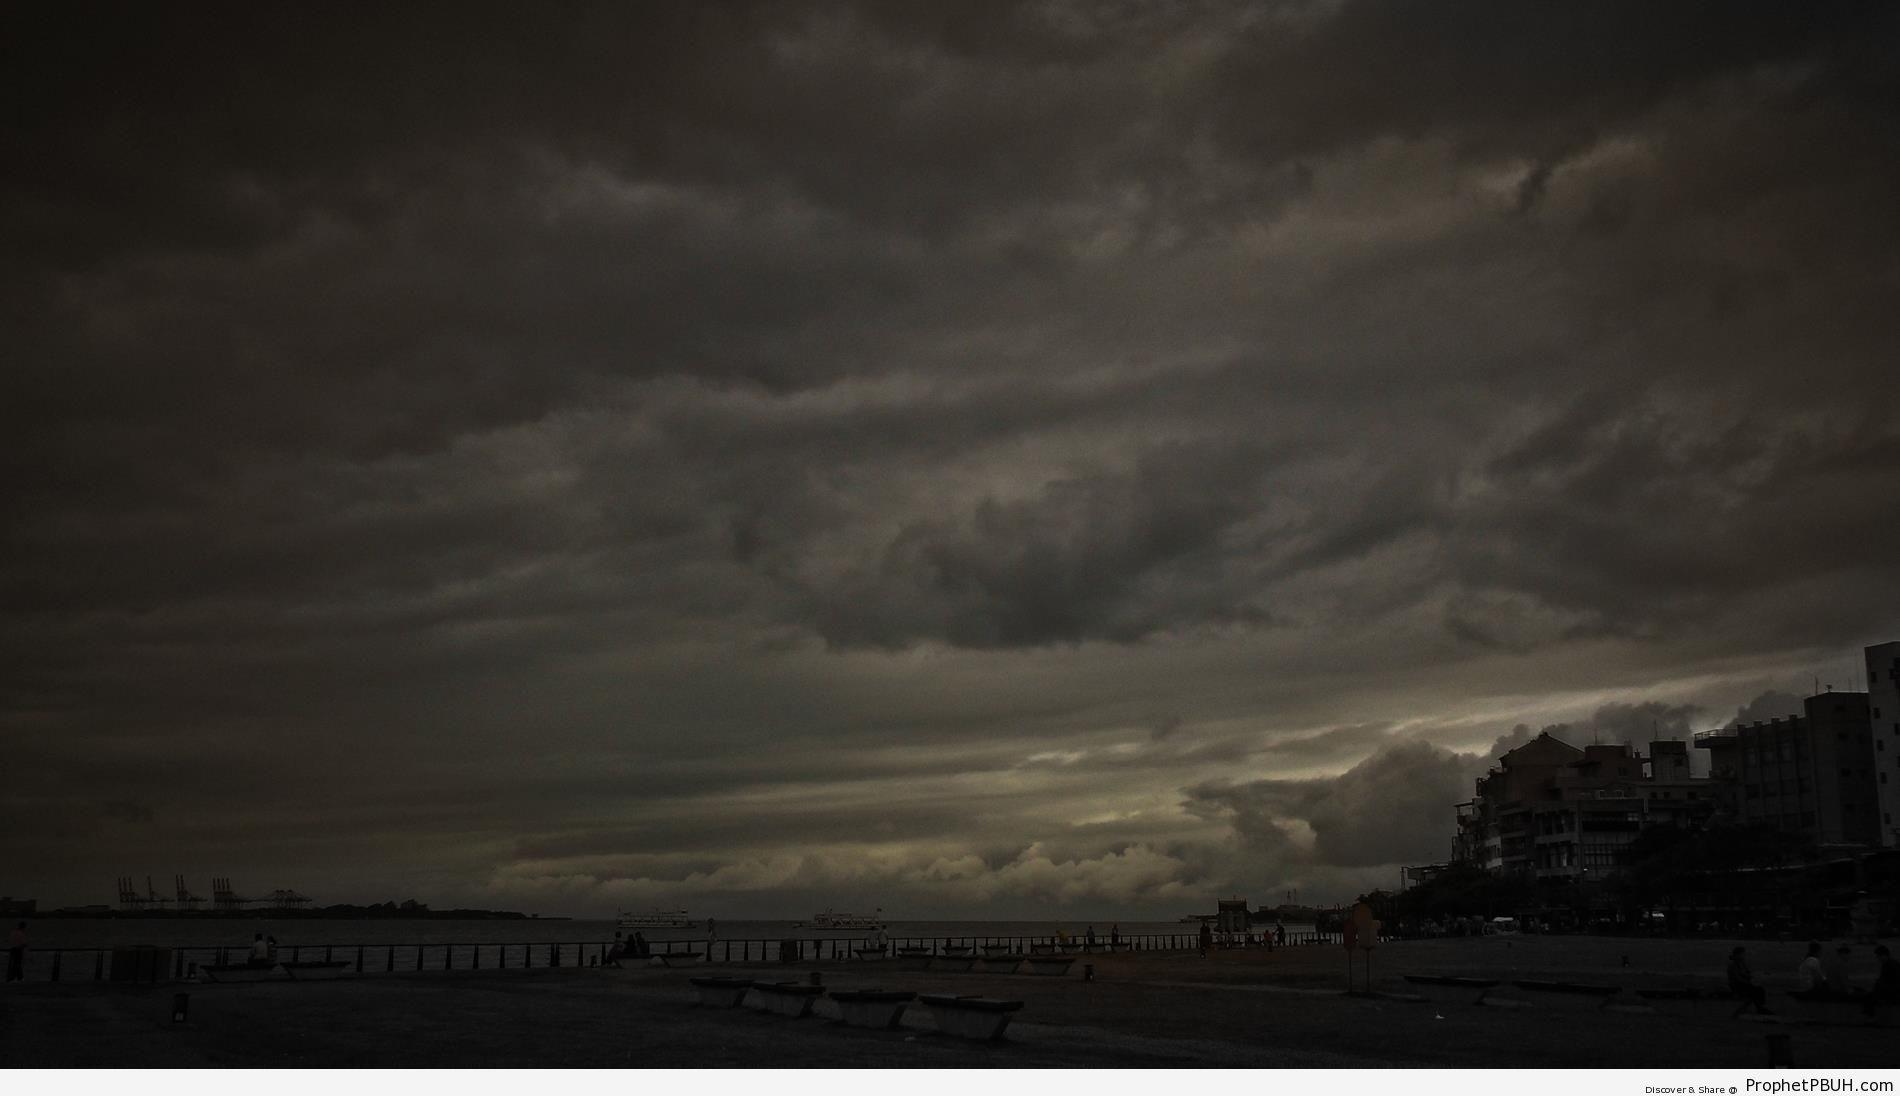 Dark Cloudy Sky (Royalty Free) - Artist- Cloud -